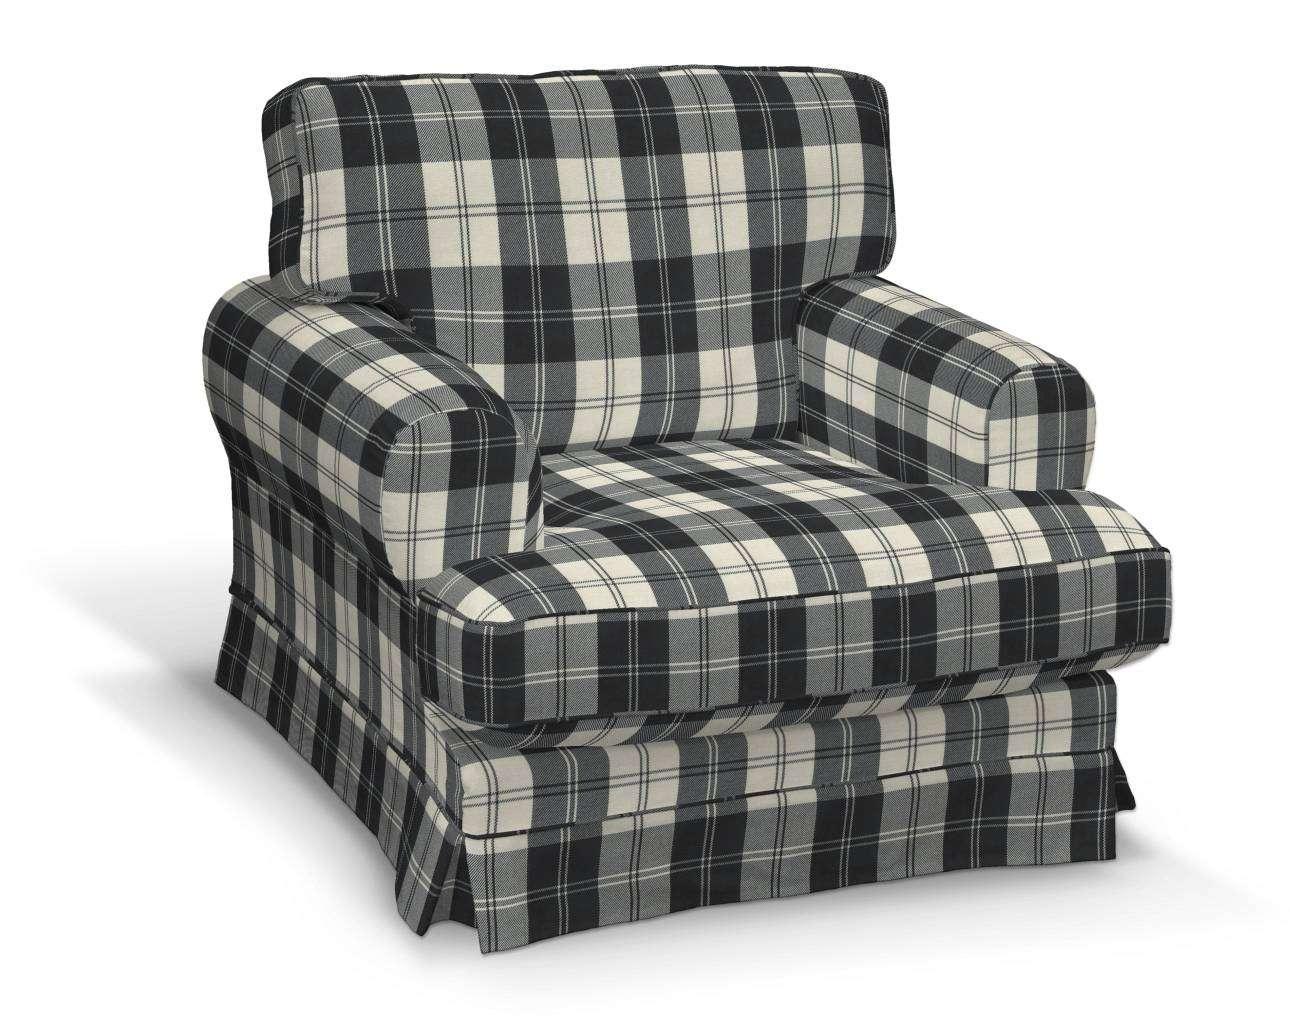 Ekeskog Sesselbezug, schwarz- weiss, Ekeskog Sessel, Edinburgh